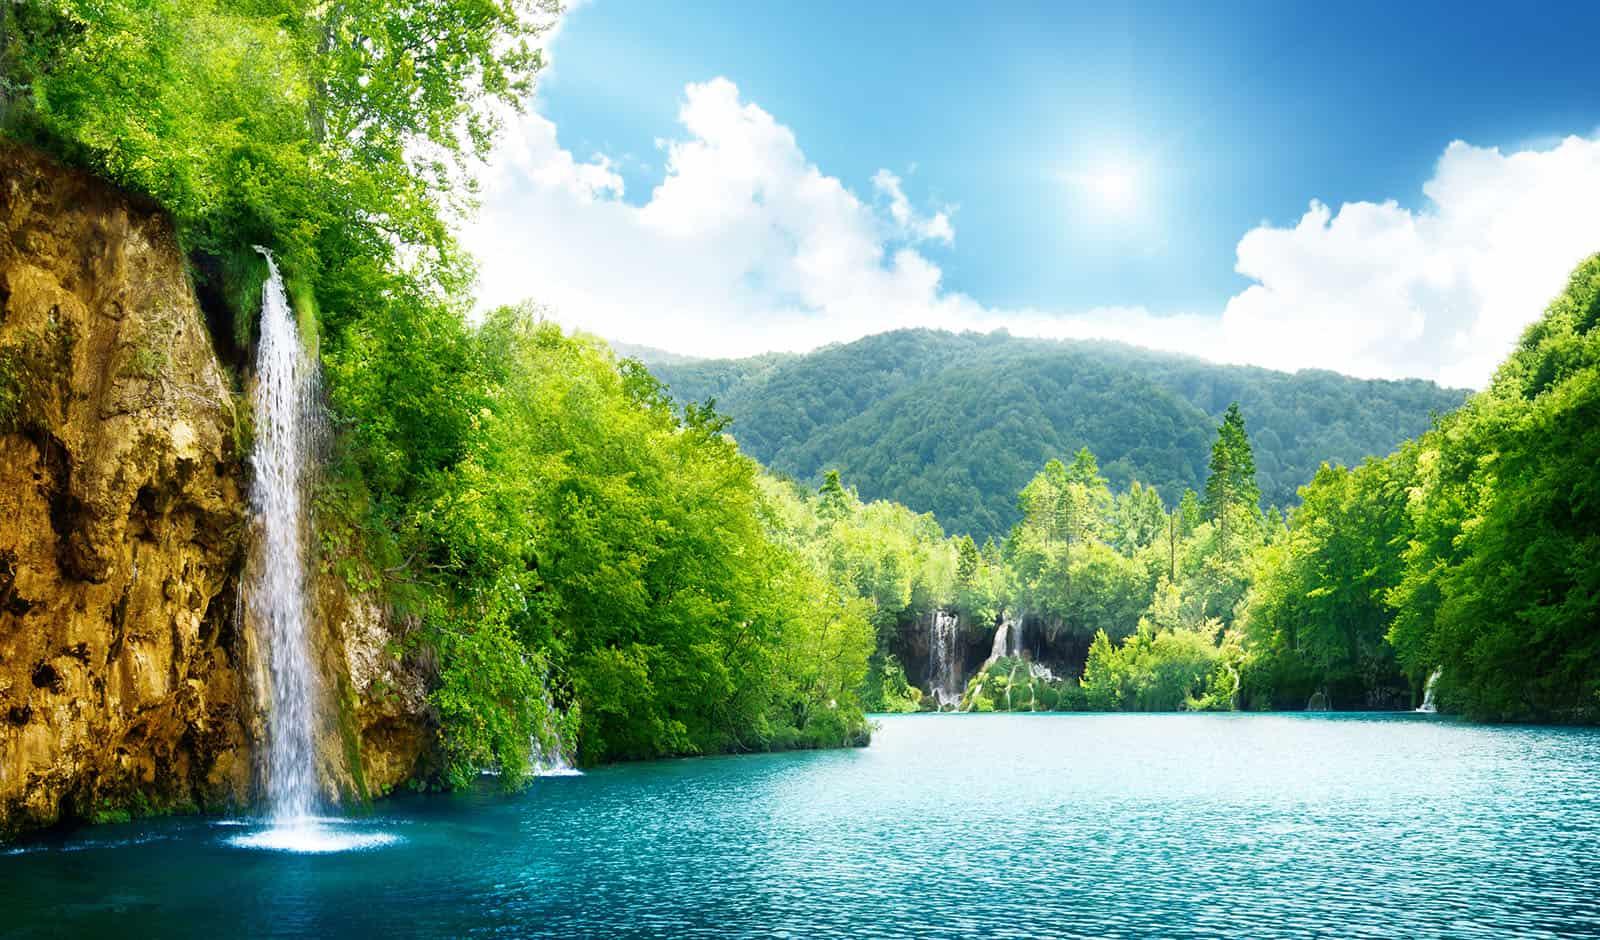 serene-outdoor-scene-with-waterfall-and-greenery